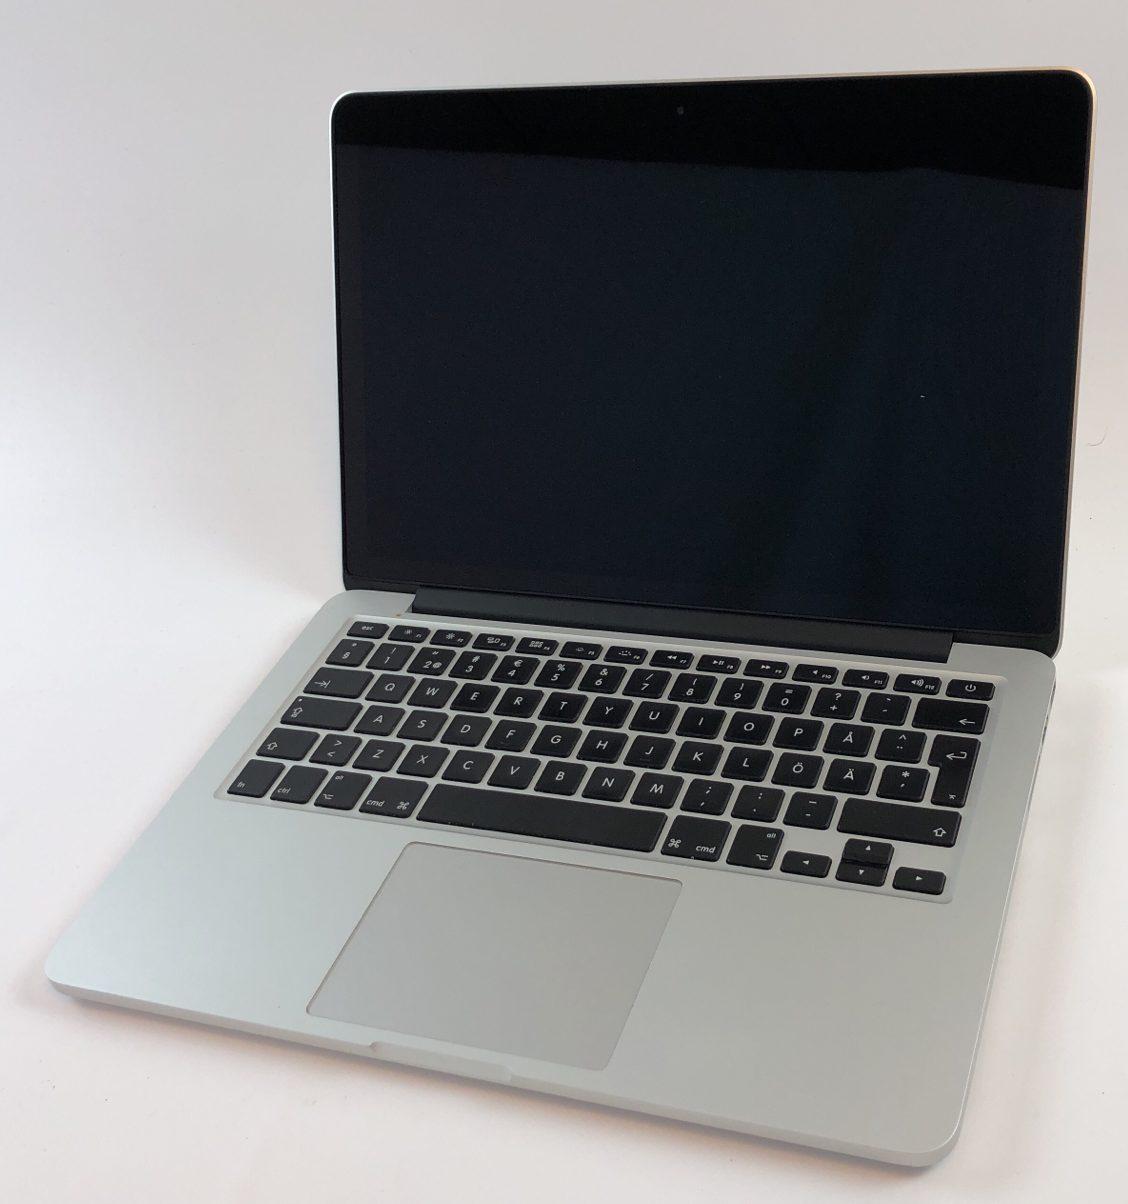 "MacBook Pro Retina 13"" Mid 2014 (Intel Core i5 2.6 GHz 16 GB RAM 128 GB SSD), Intel Core i5 2.6 GHz, 16 GB RAM, 128 GB SSD, Kuva 1"